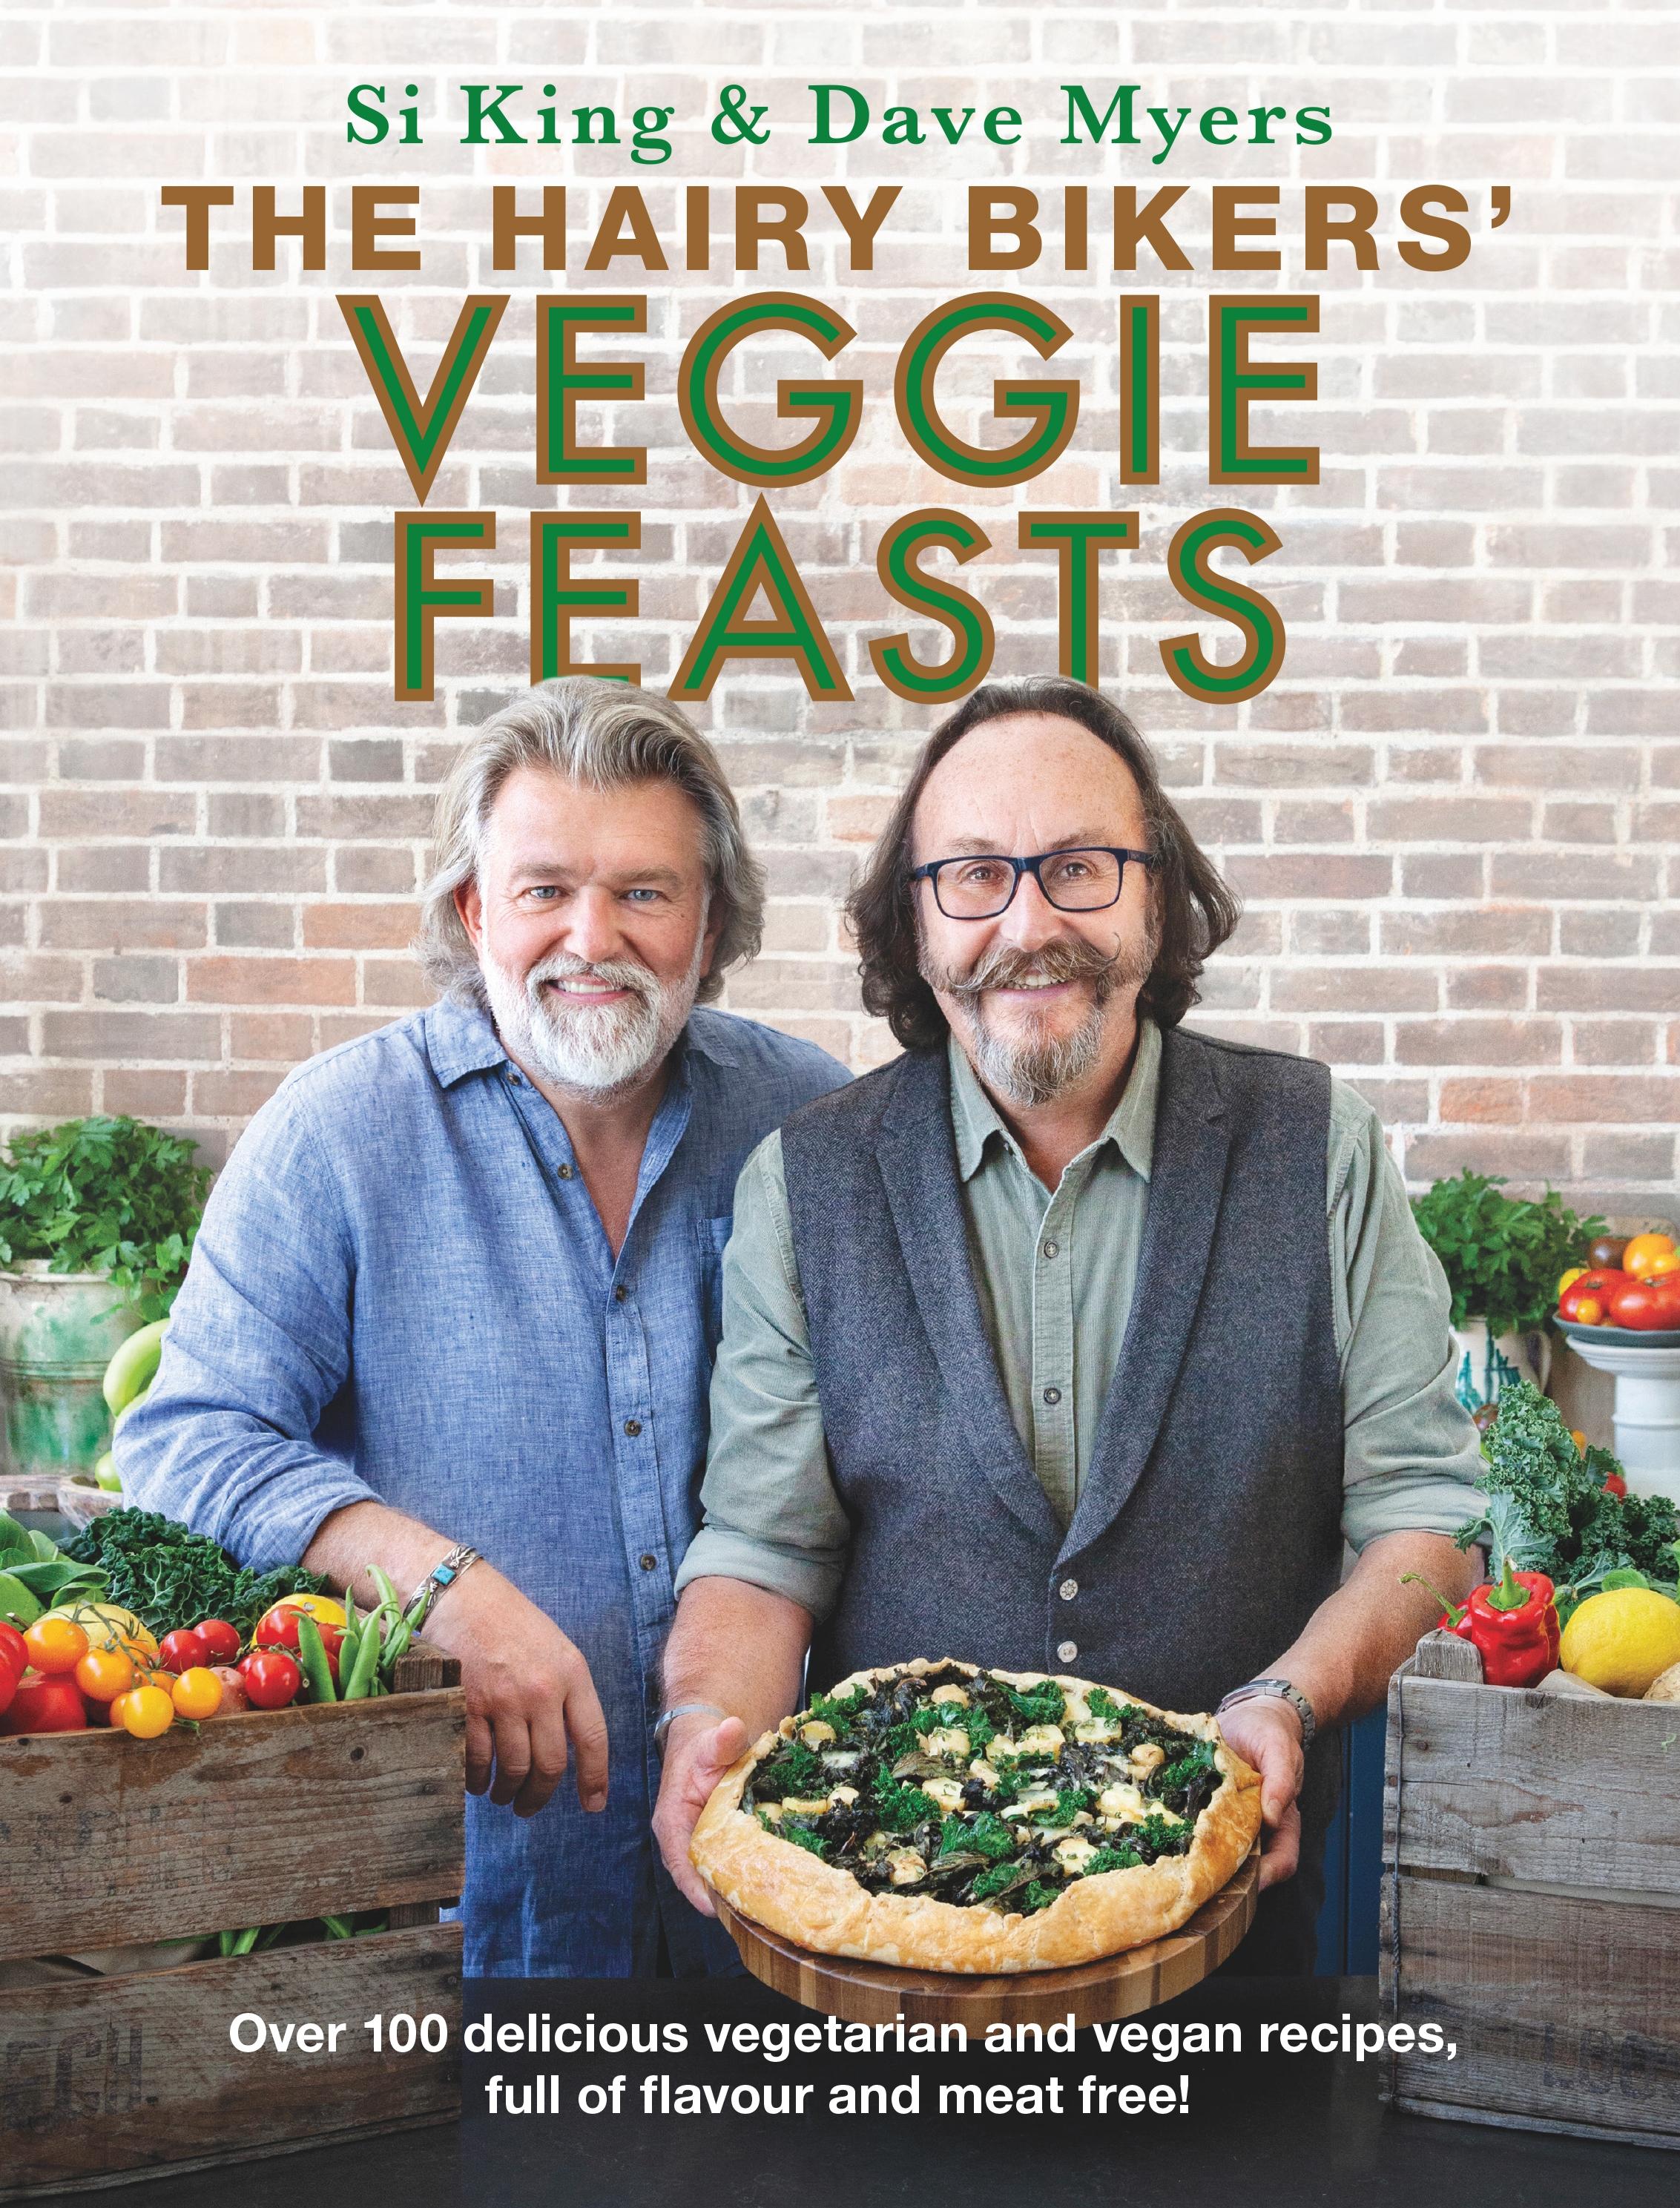 Hairy Bikers Veggie Feasts cover